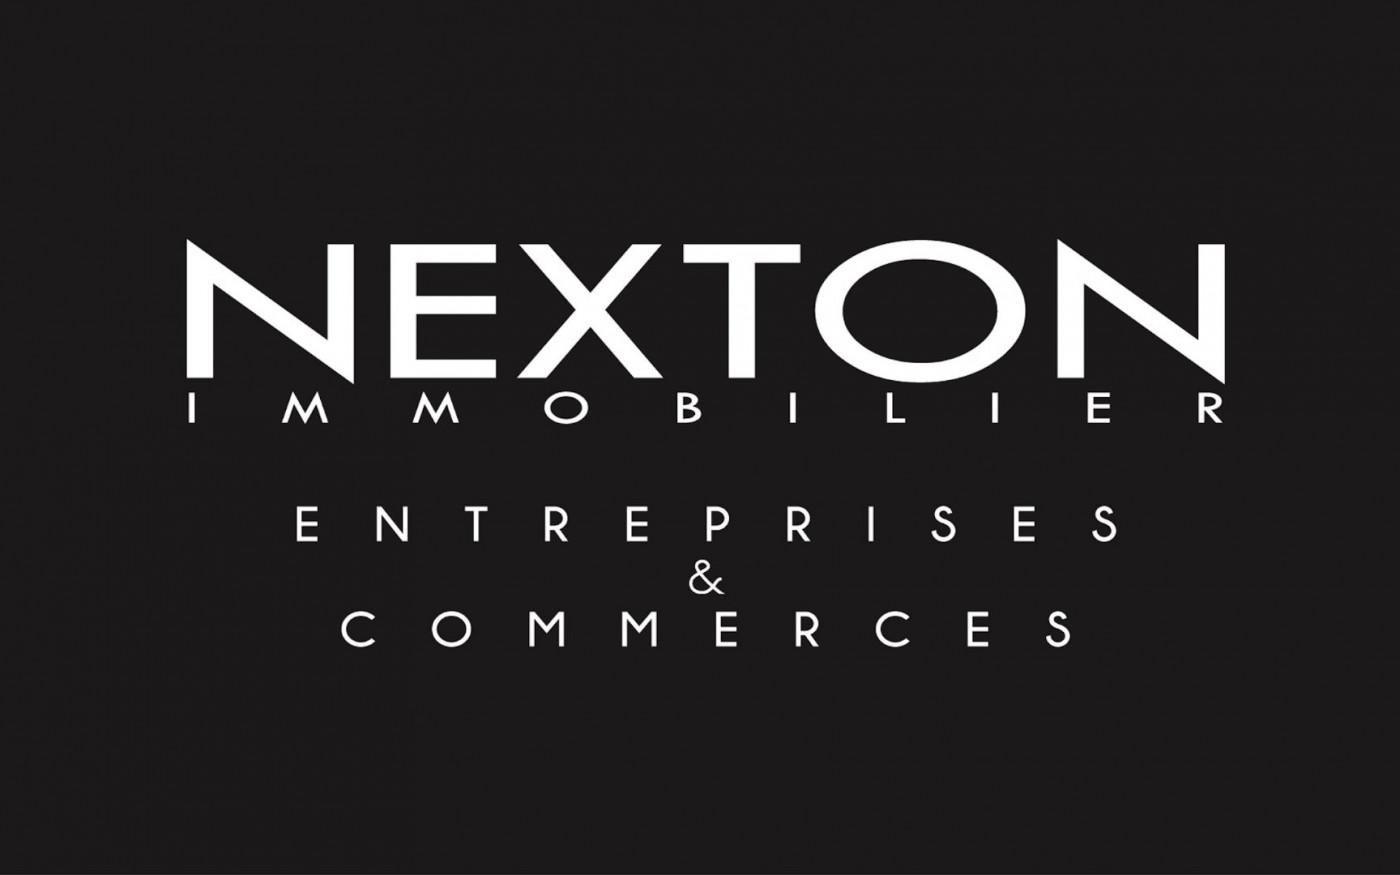 A vendre  Capbreton | Réf 40012134 - Nexton immobilier